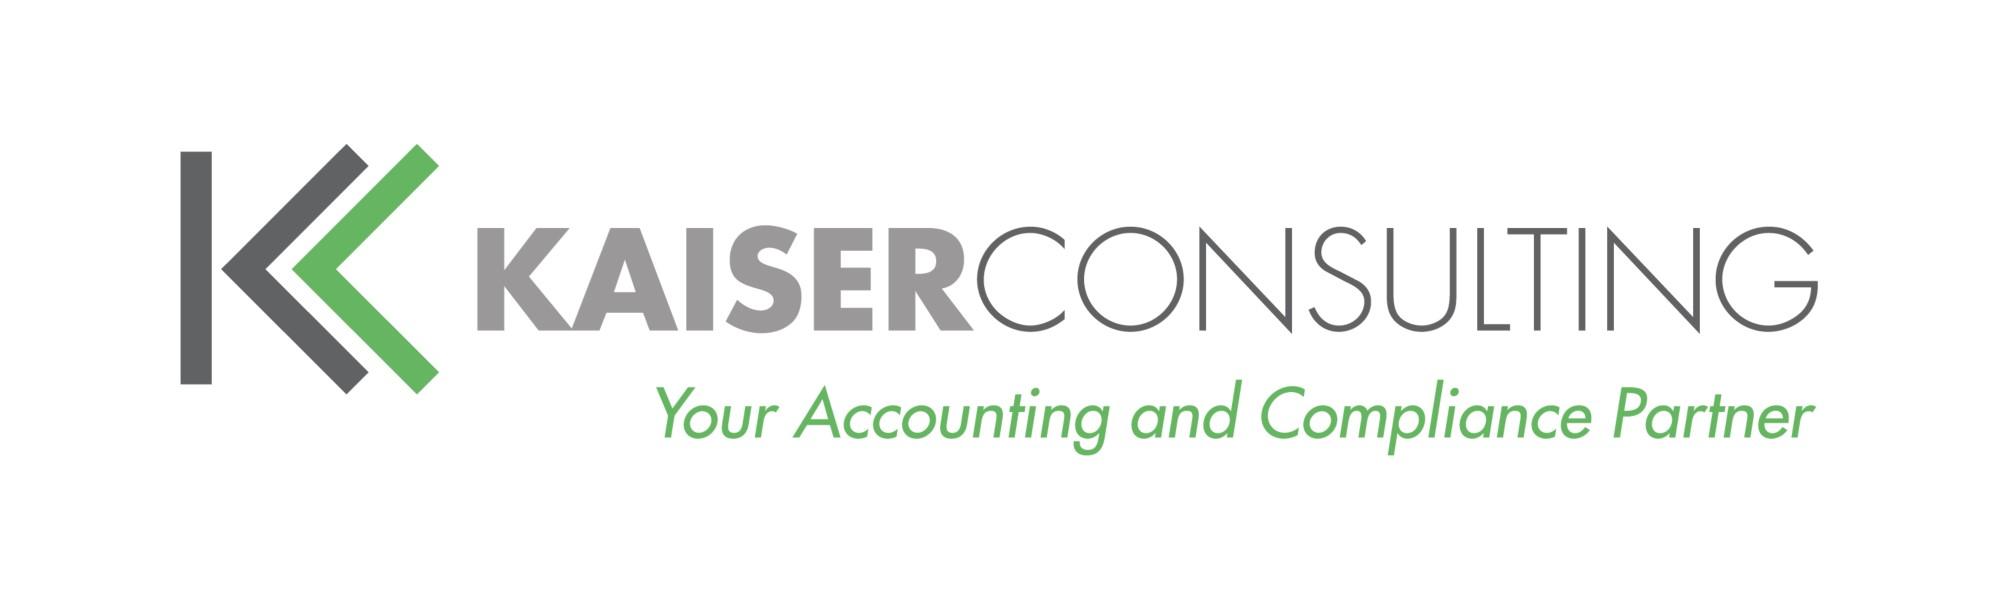 KaiserConsultingLLC Logo